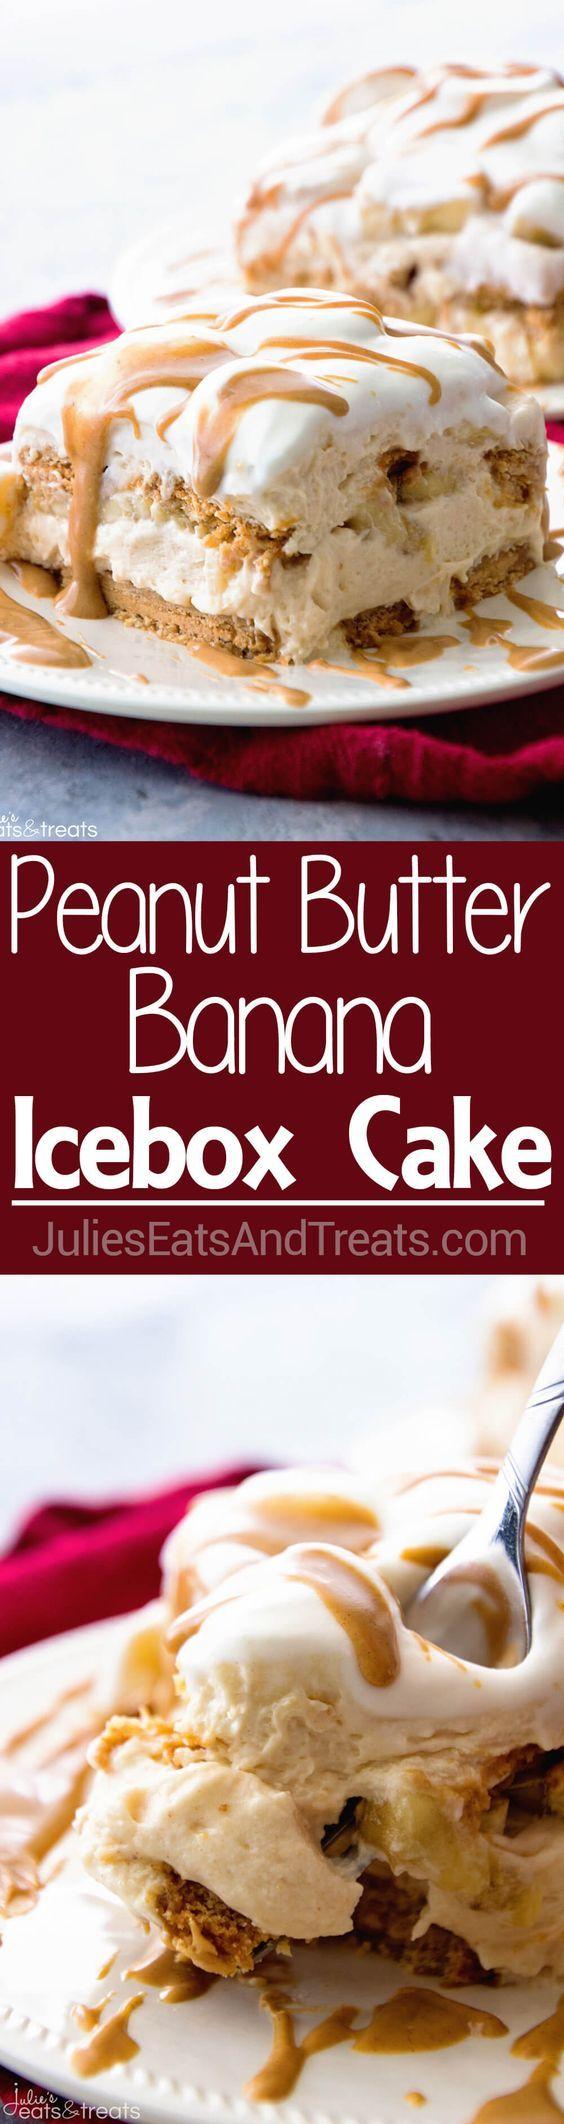 Peanut Butter and Banana Icebox Cake ~ Homemade Light